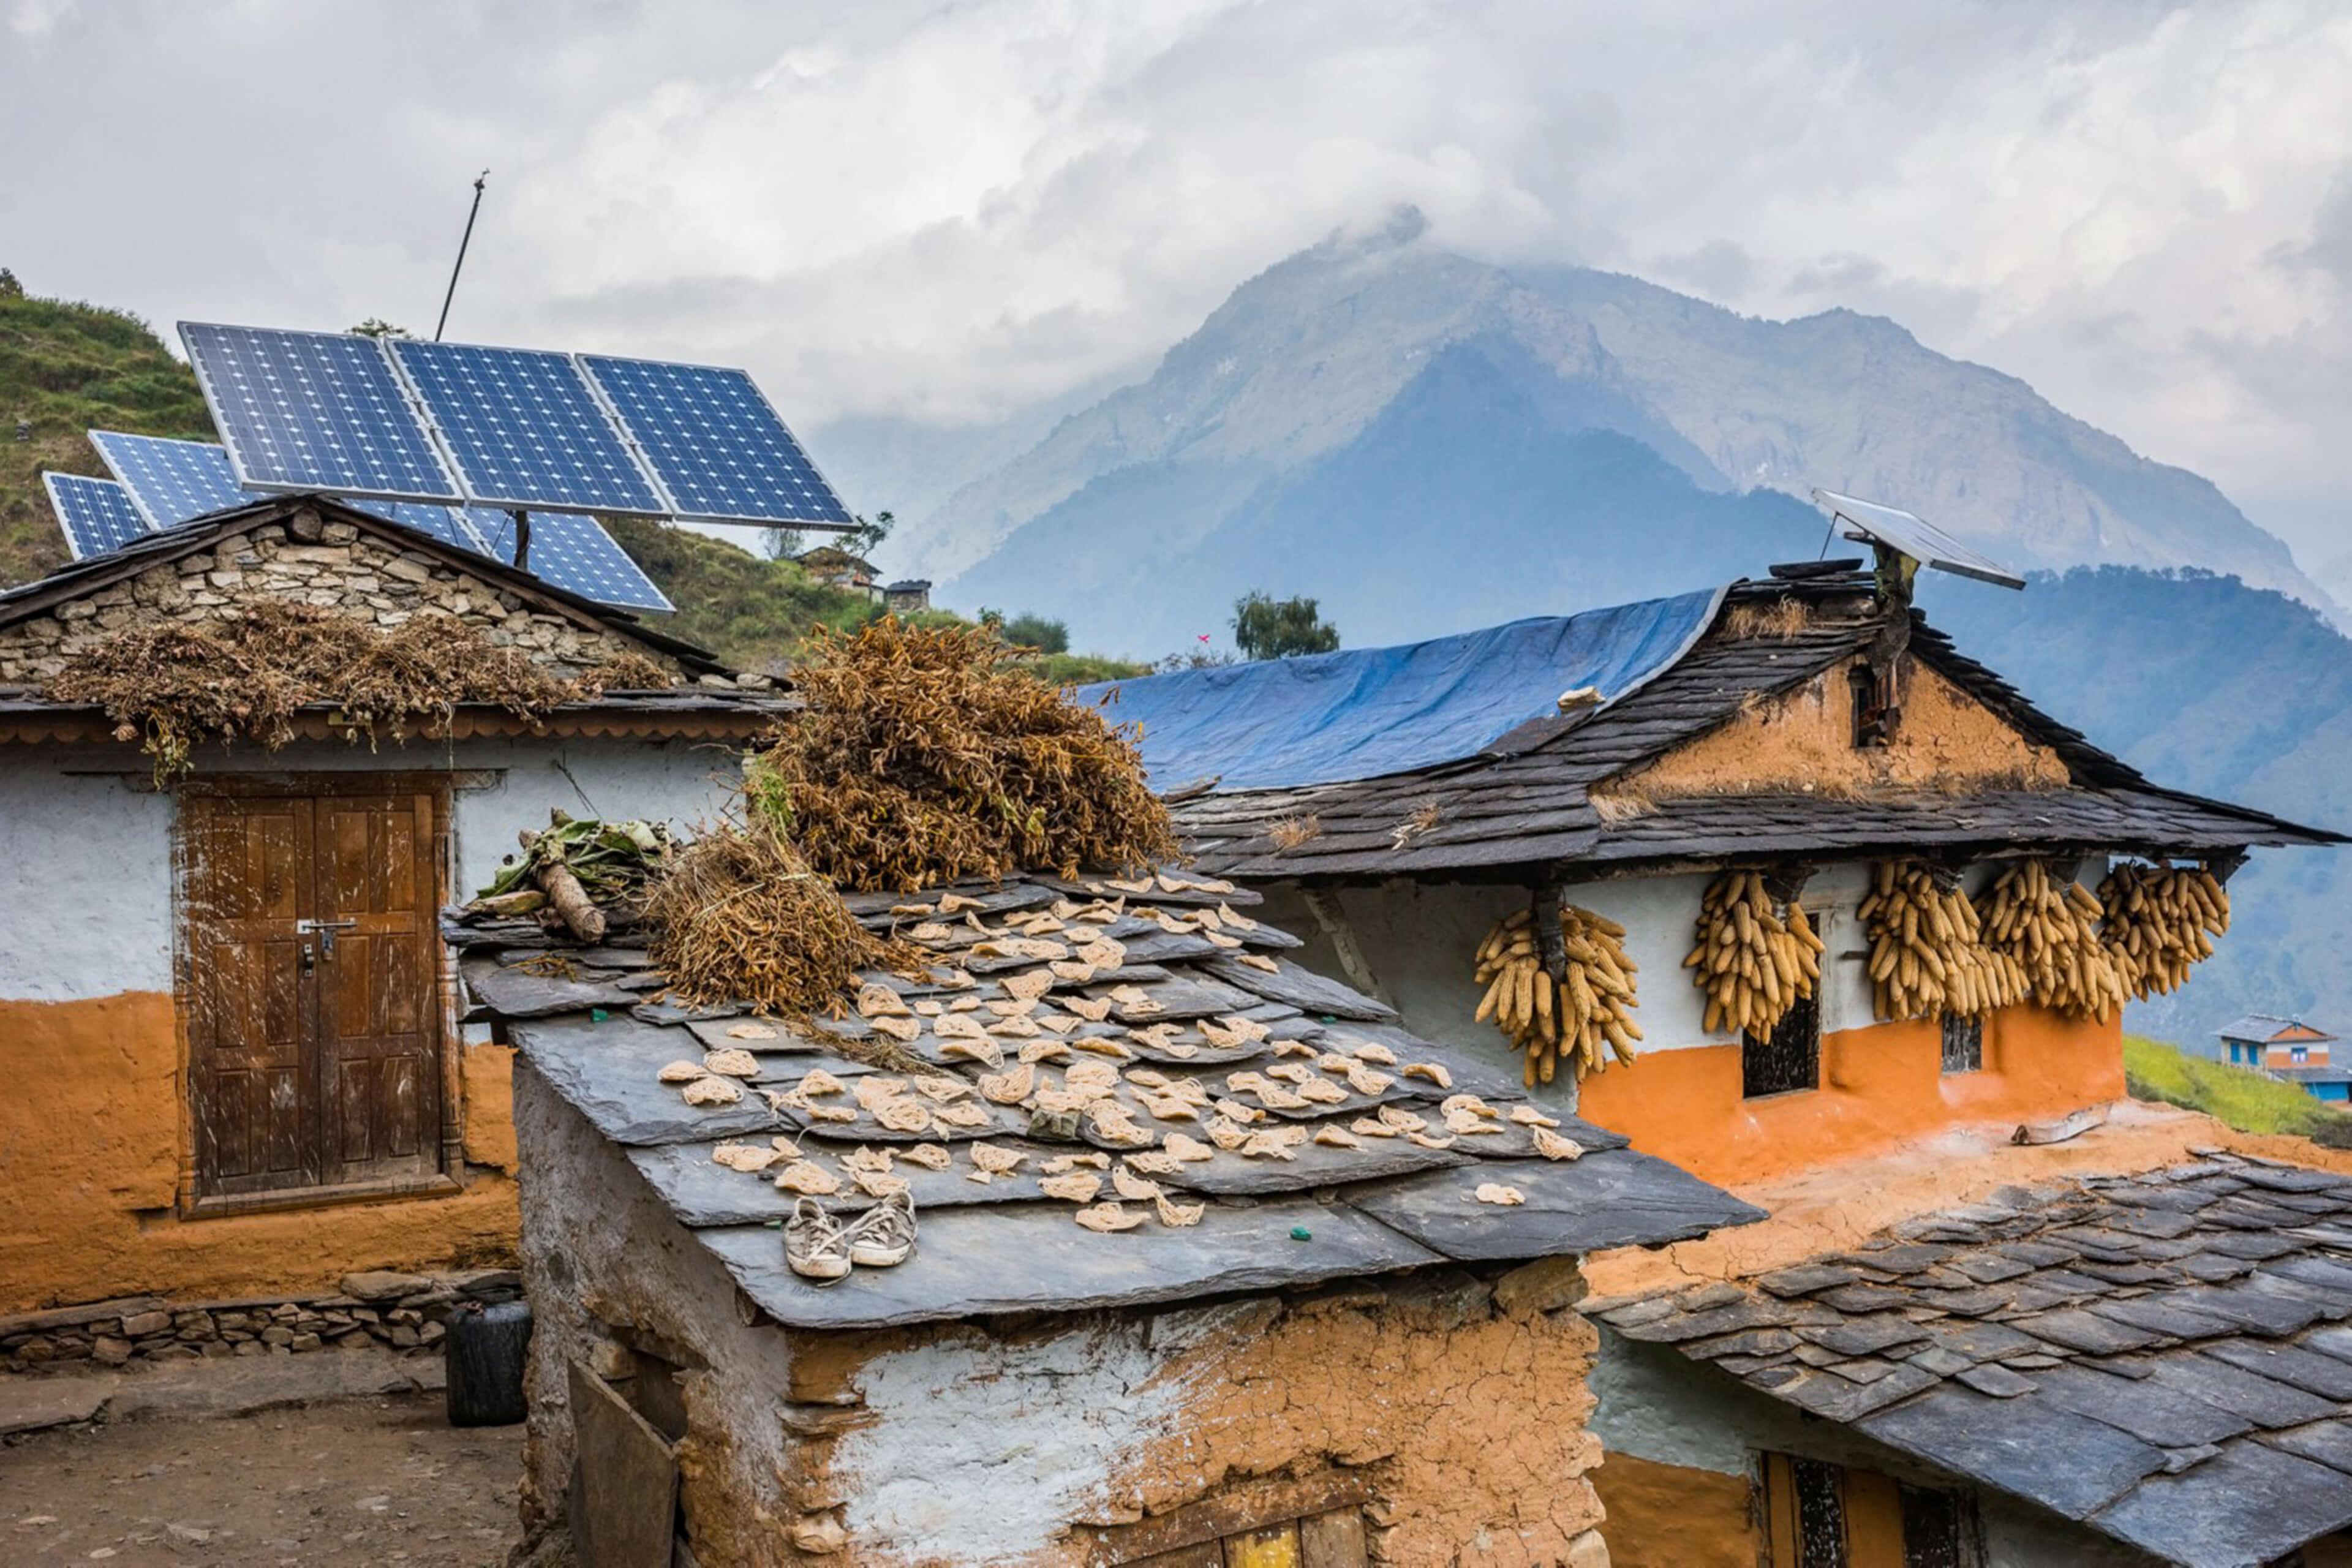 Solar panels in rural community